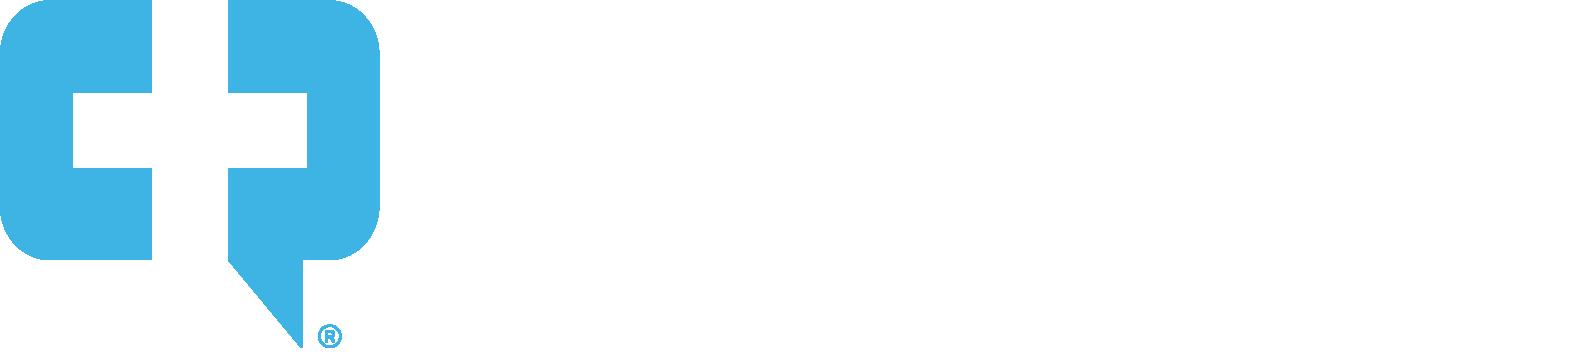 2nd.md logo